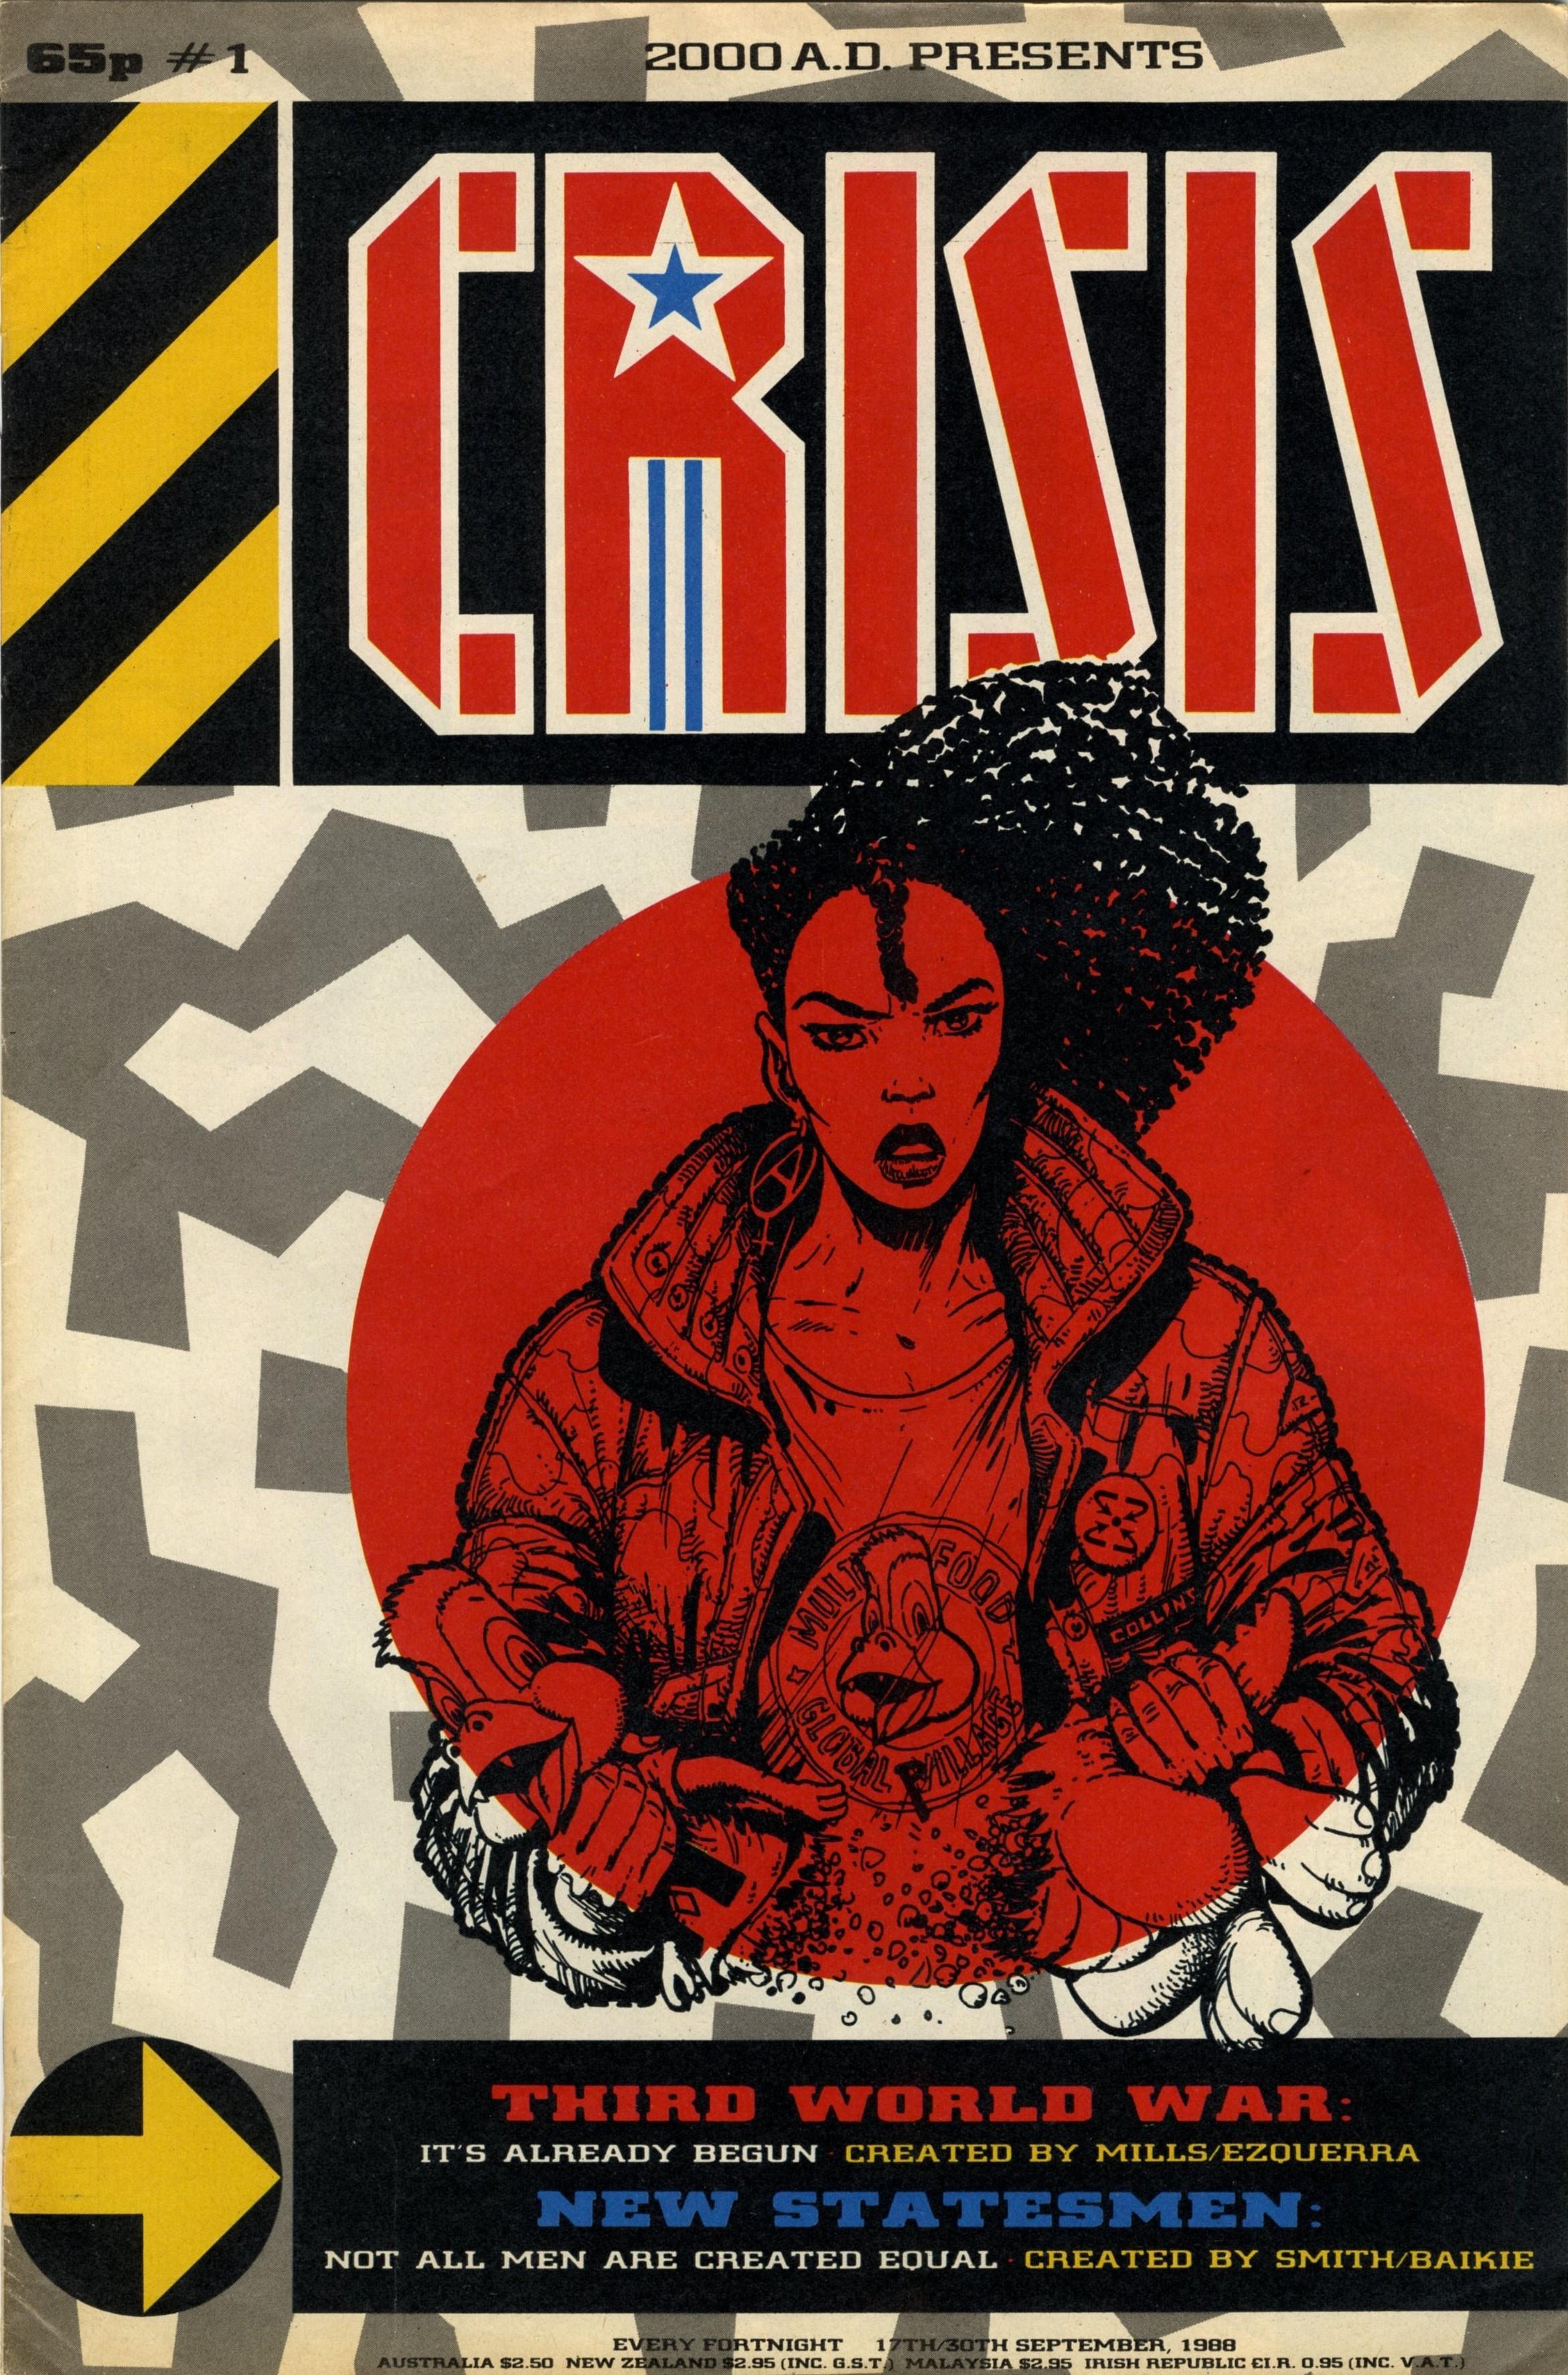 Cover artwork: Carlos Ezquerra